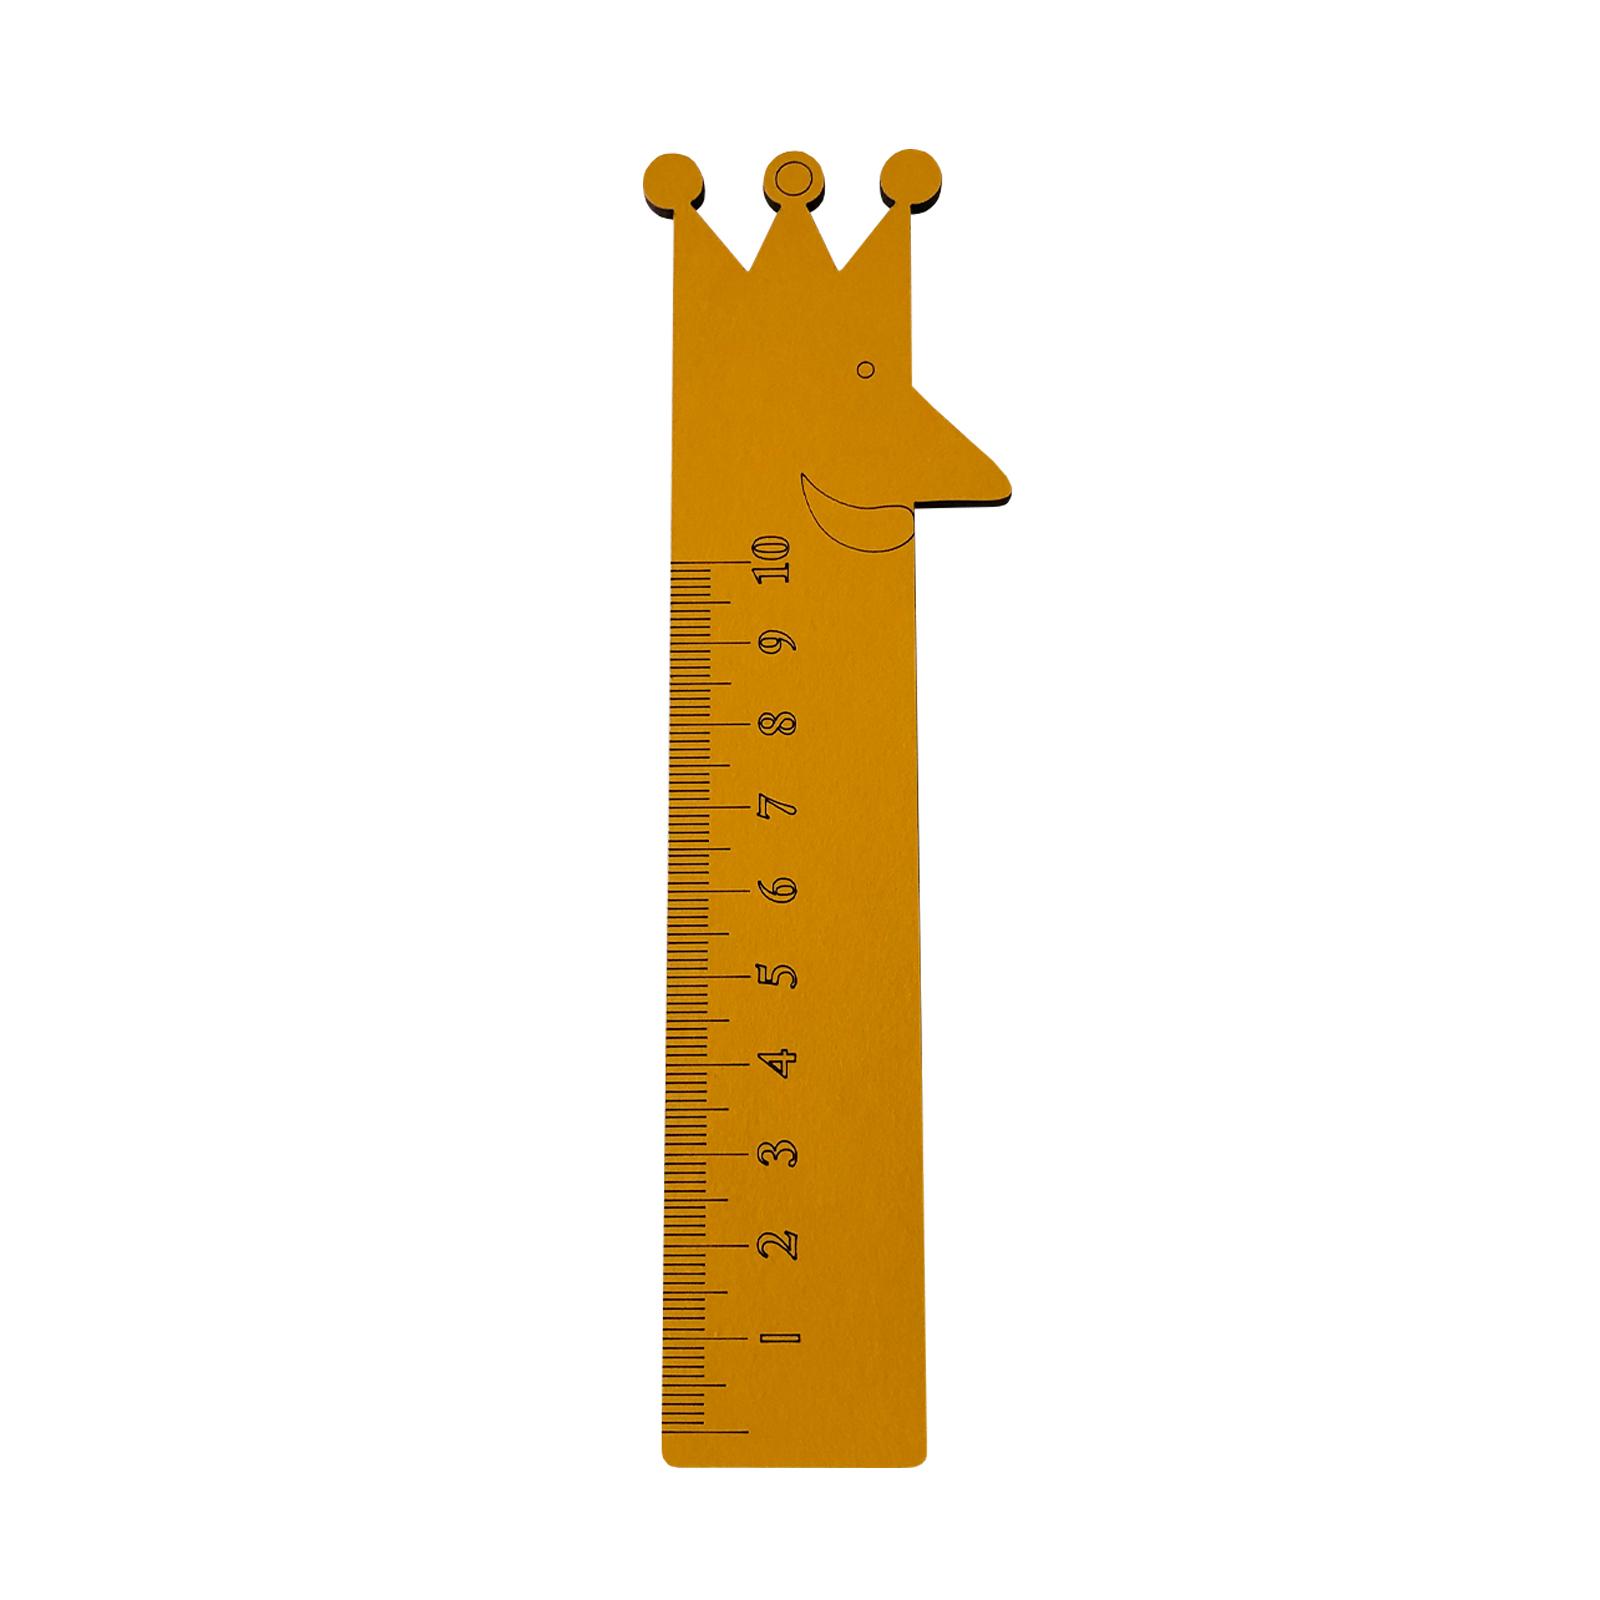 خط کش 10 سانتی متری طرح پادشاه کد kh7